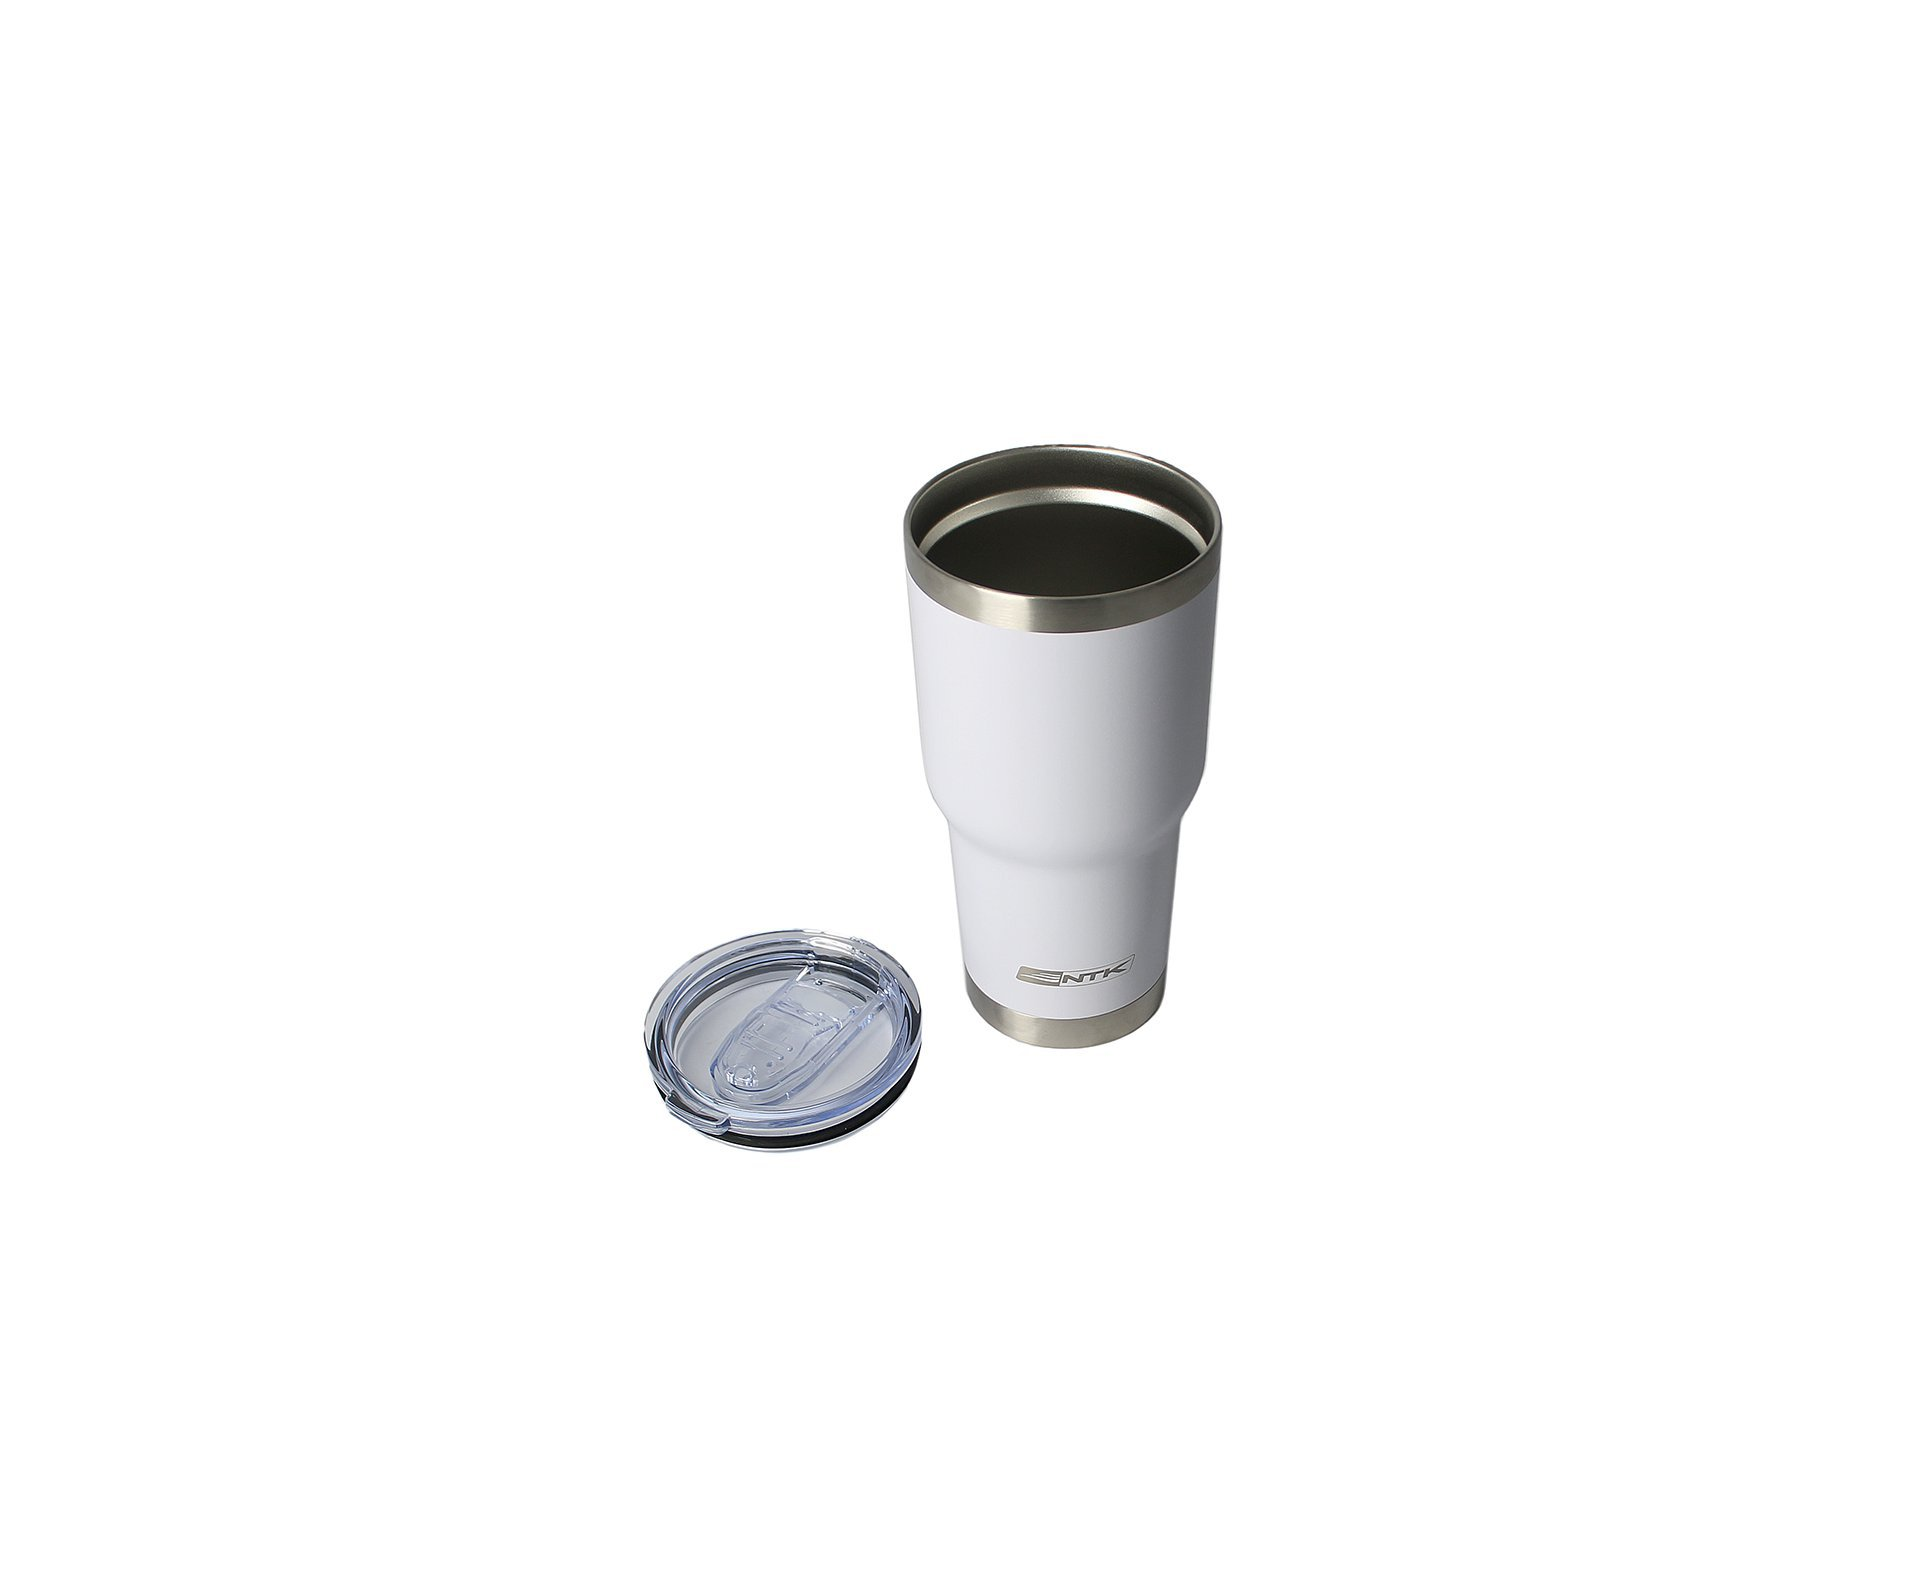 Copo Térmico Inox Nautika Siluet Branco 850 Ml + 02 Canudos Metal + Escova Limpeza